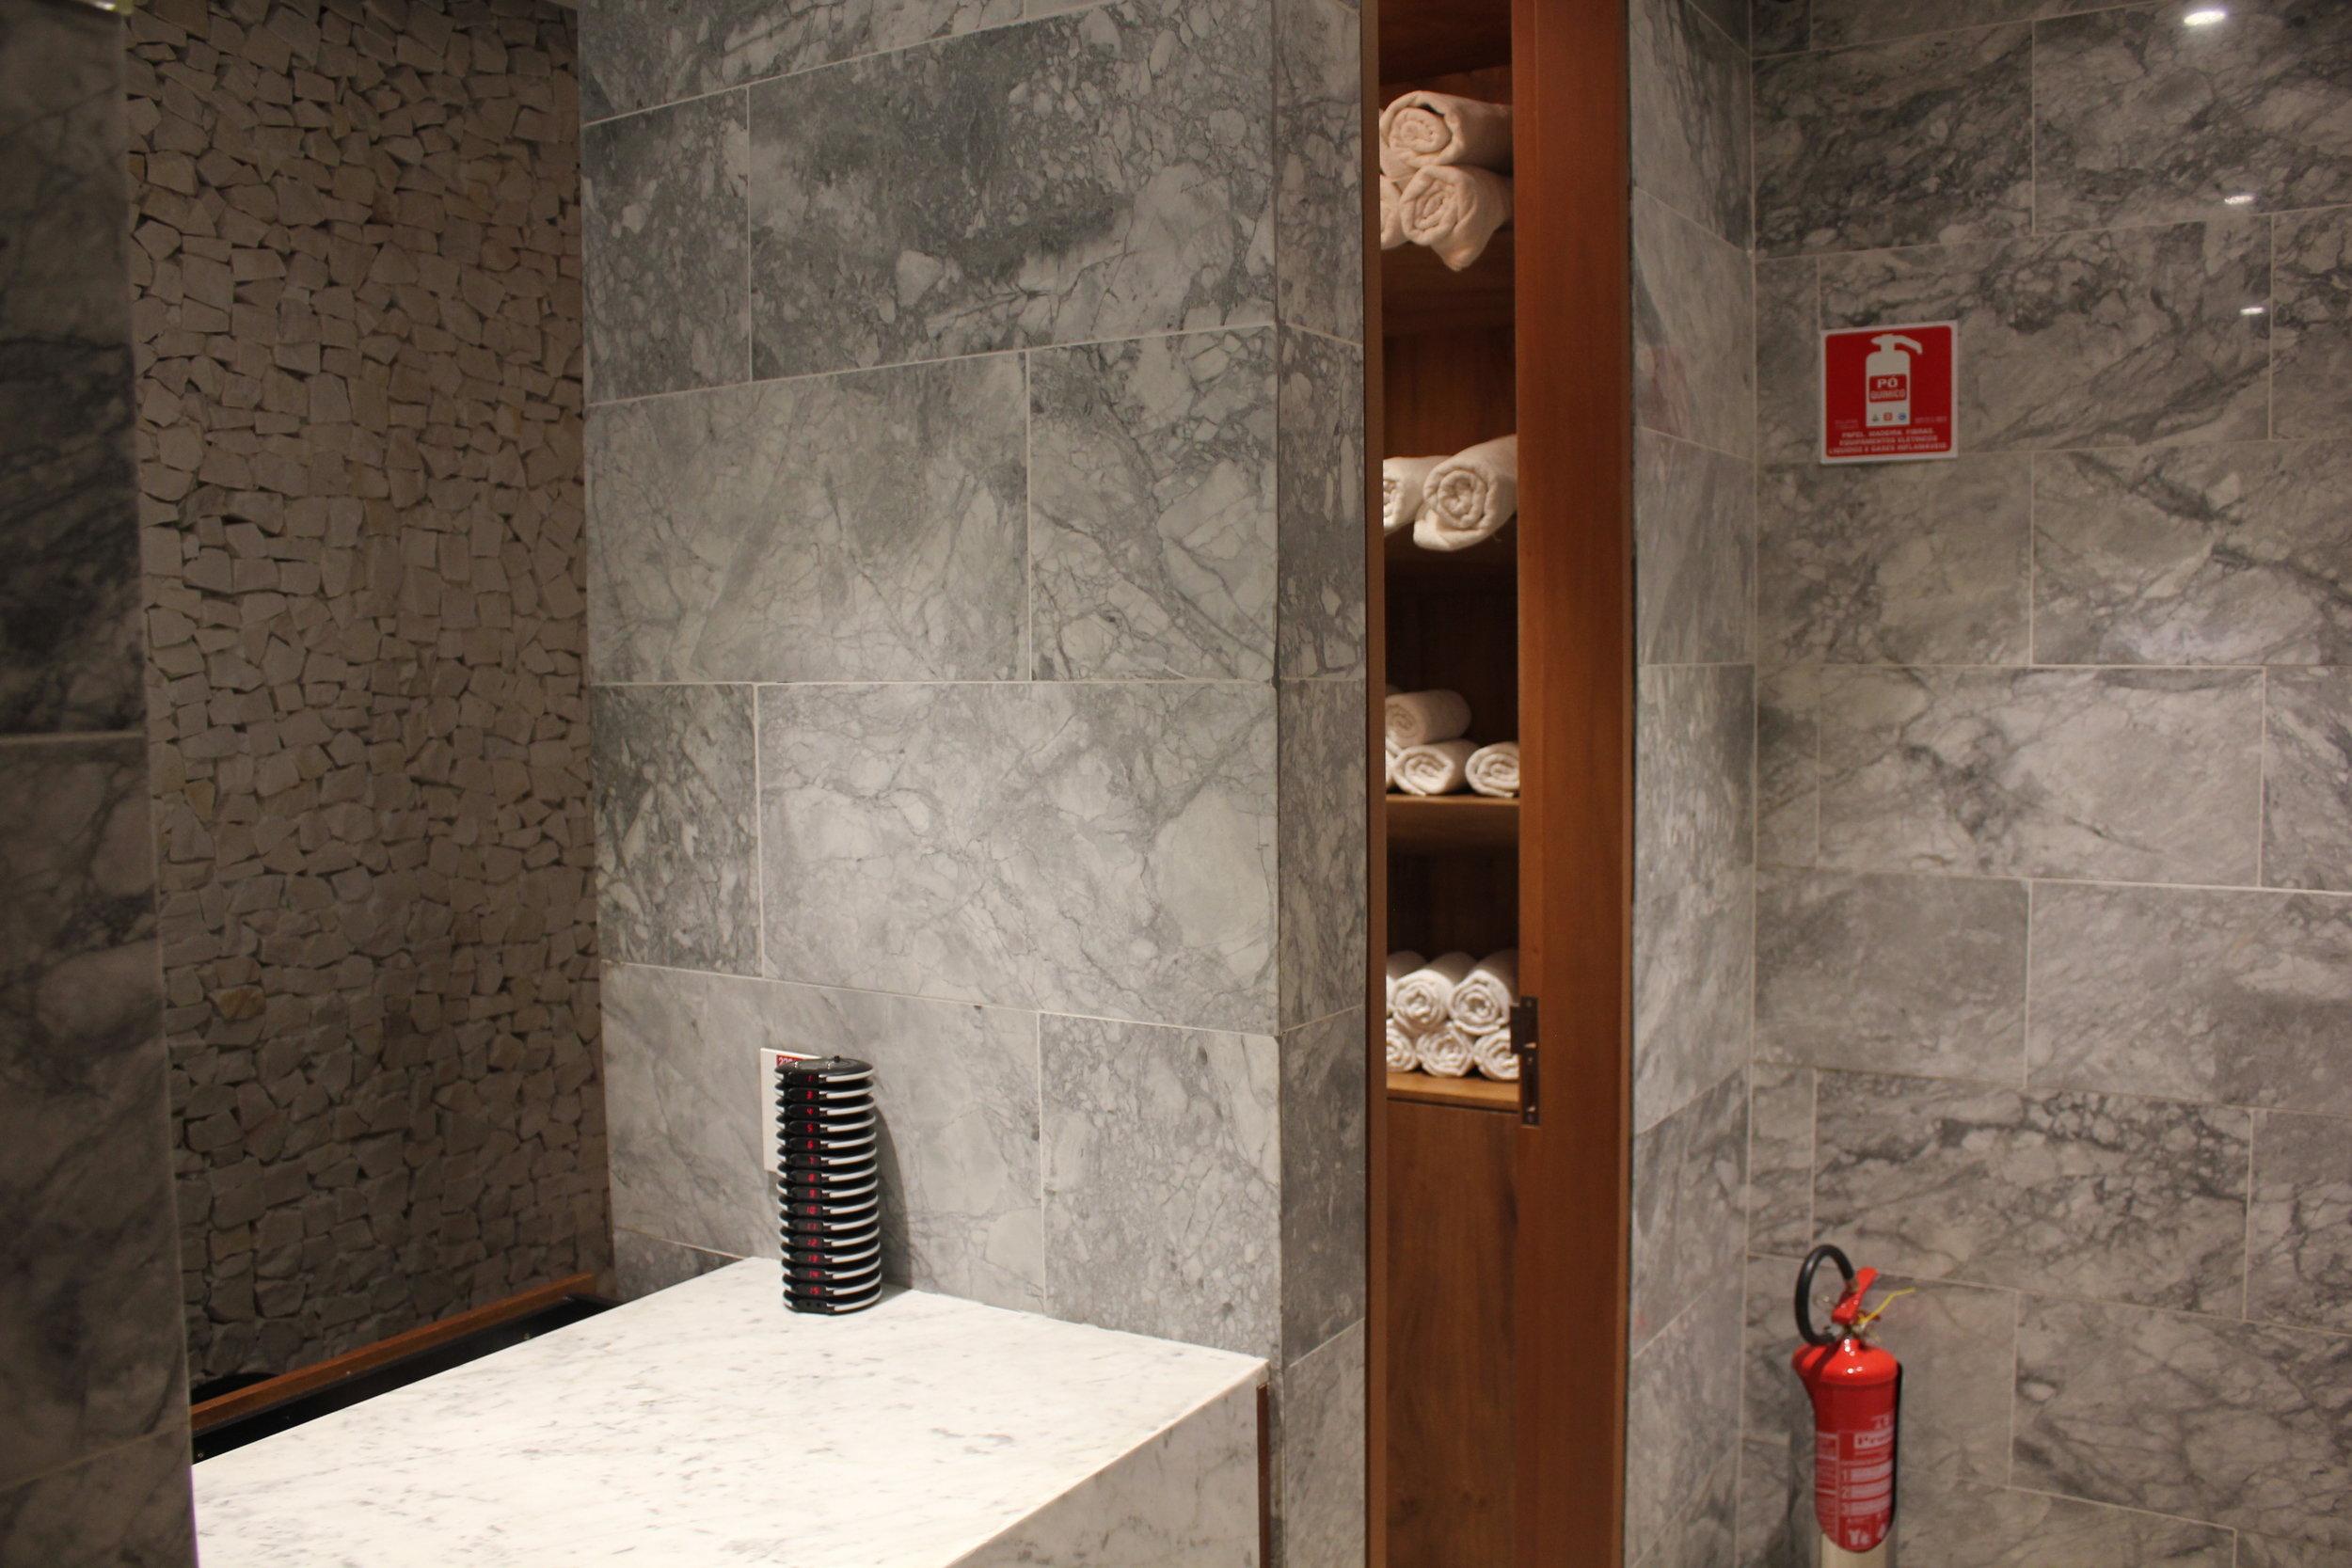 Star Alliance Lounge Rio de Janeiro – Shower attendant's desk